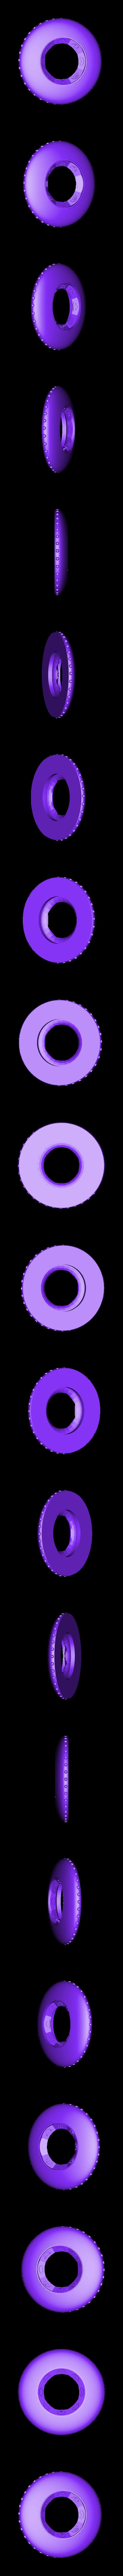 saucer_top.stl Download free STL file Flying Saucer • 3D print model, NohaBody